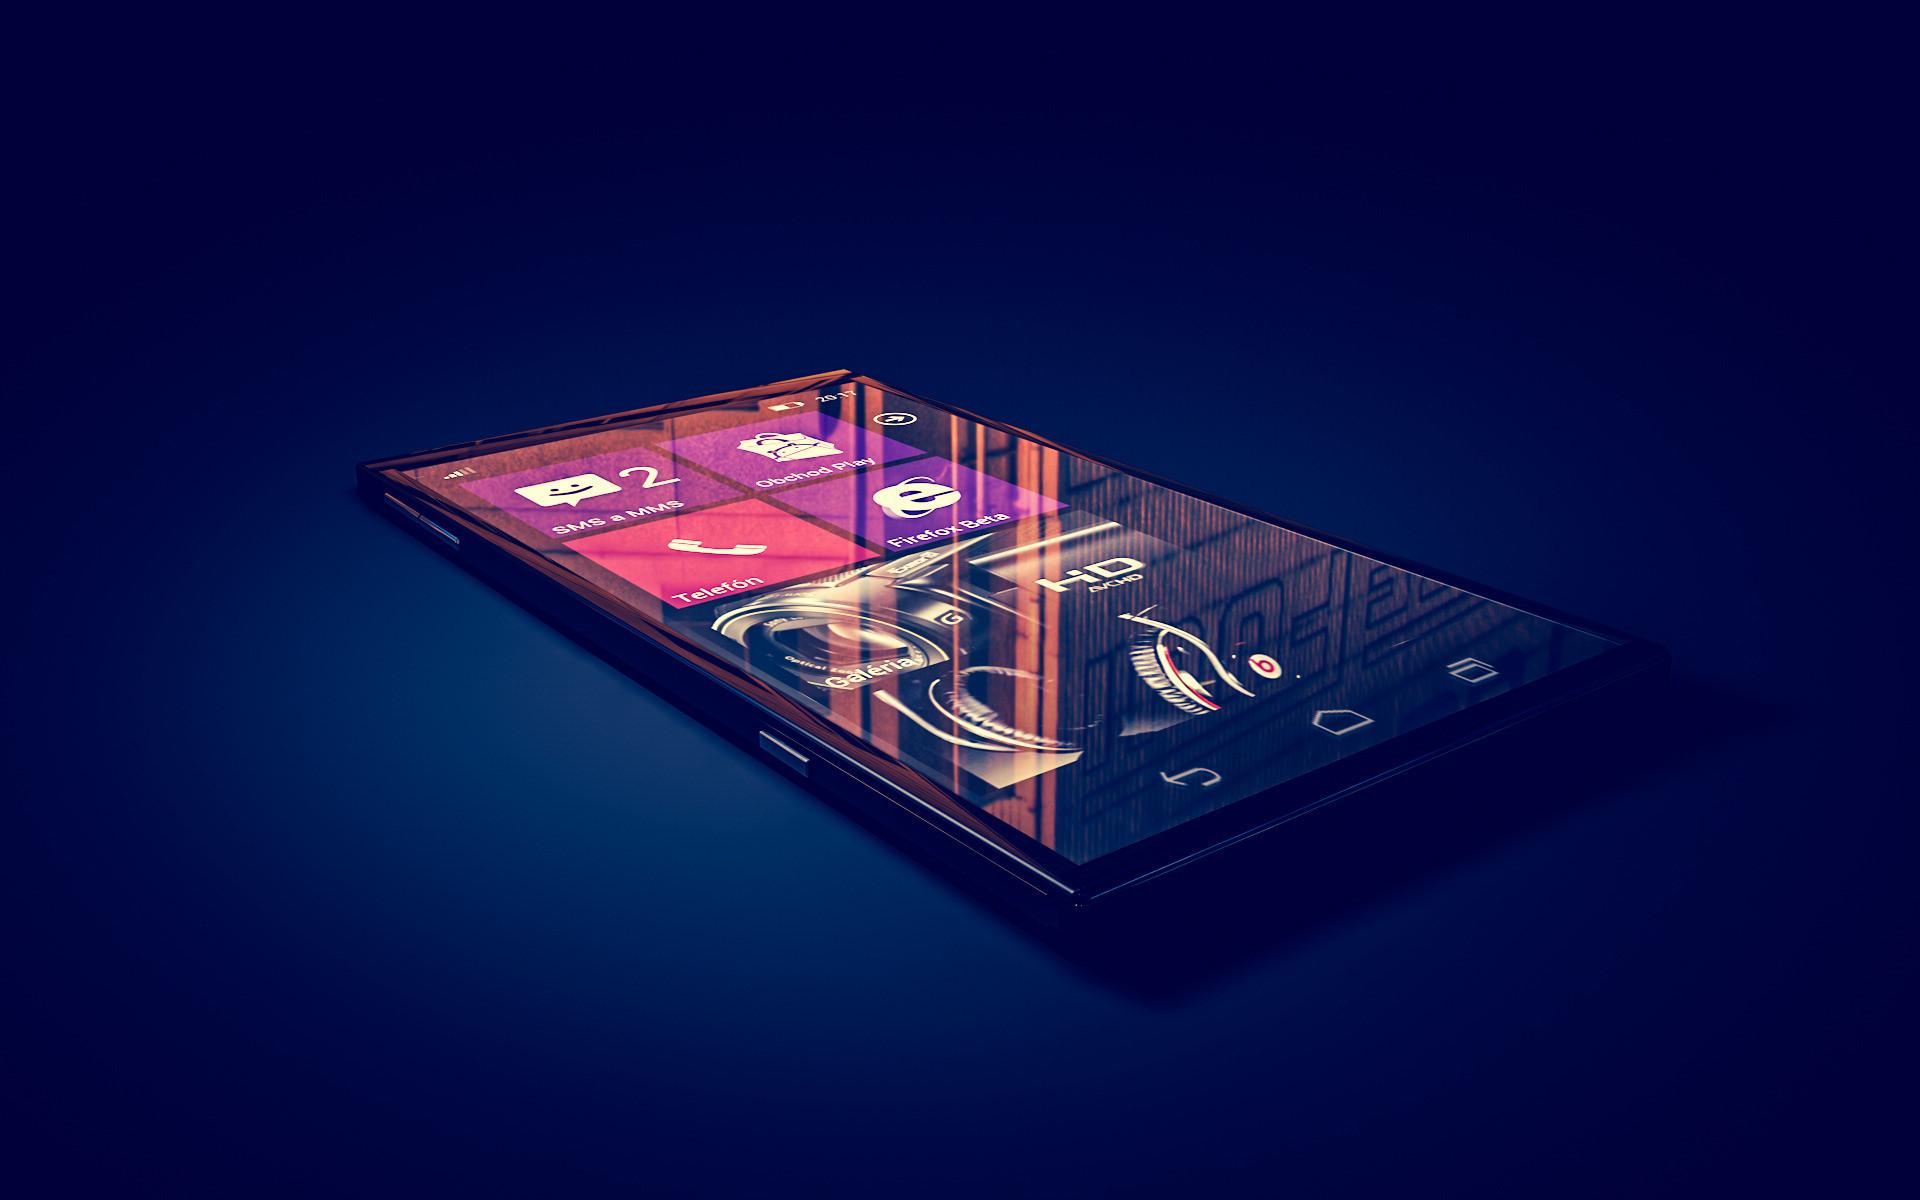 … Windows Phone HD Wallpapers Group (3)